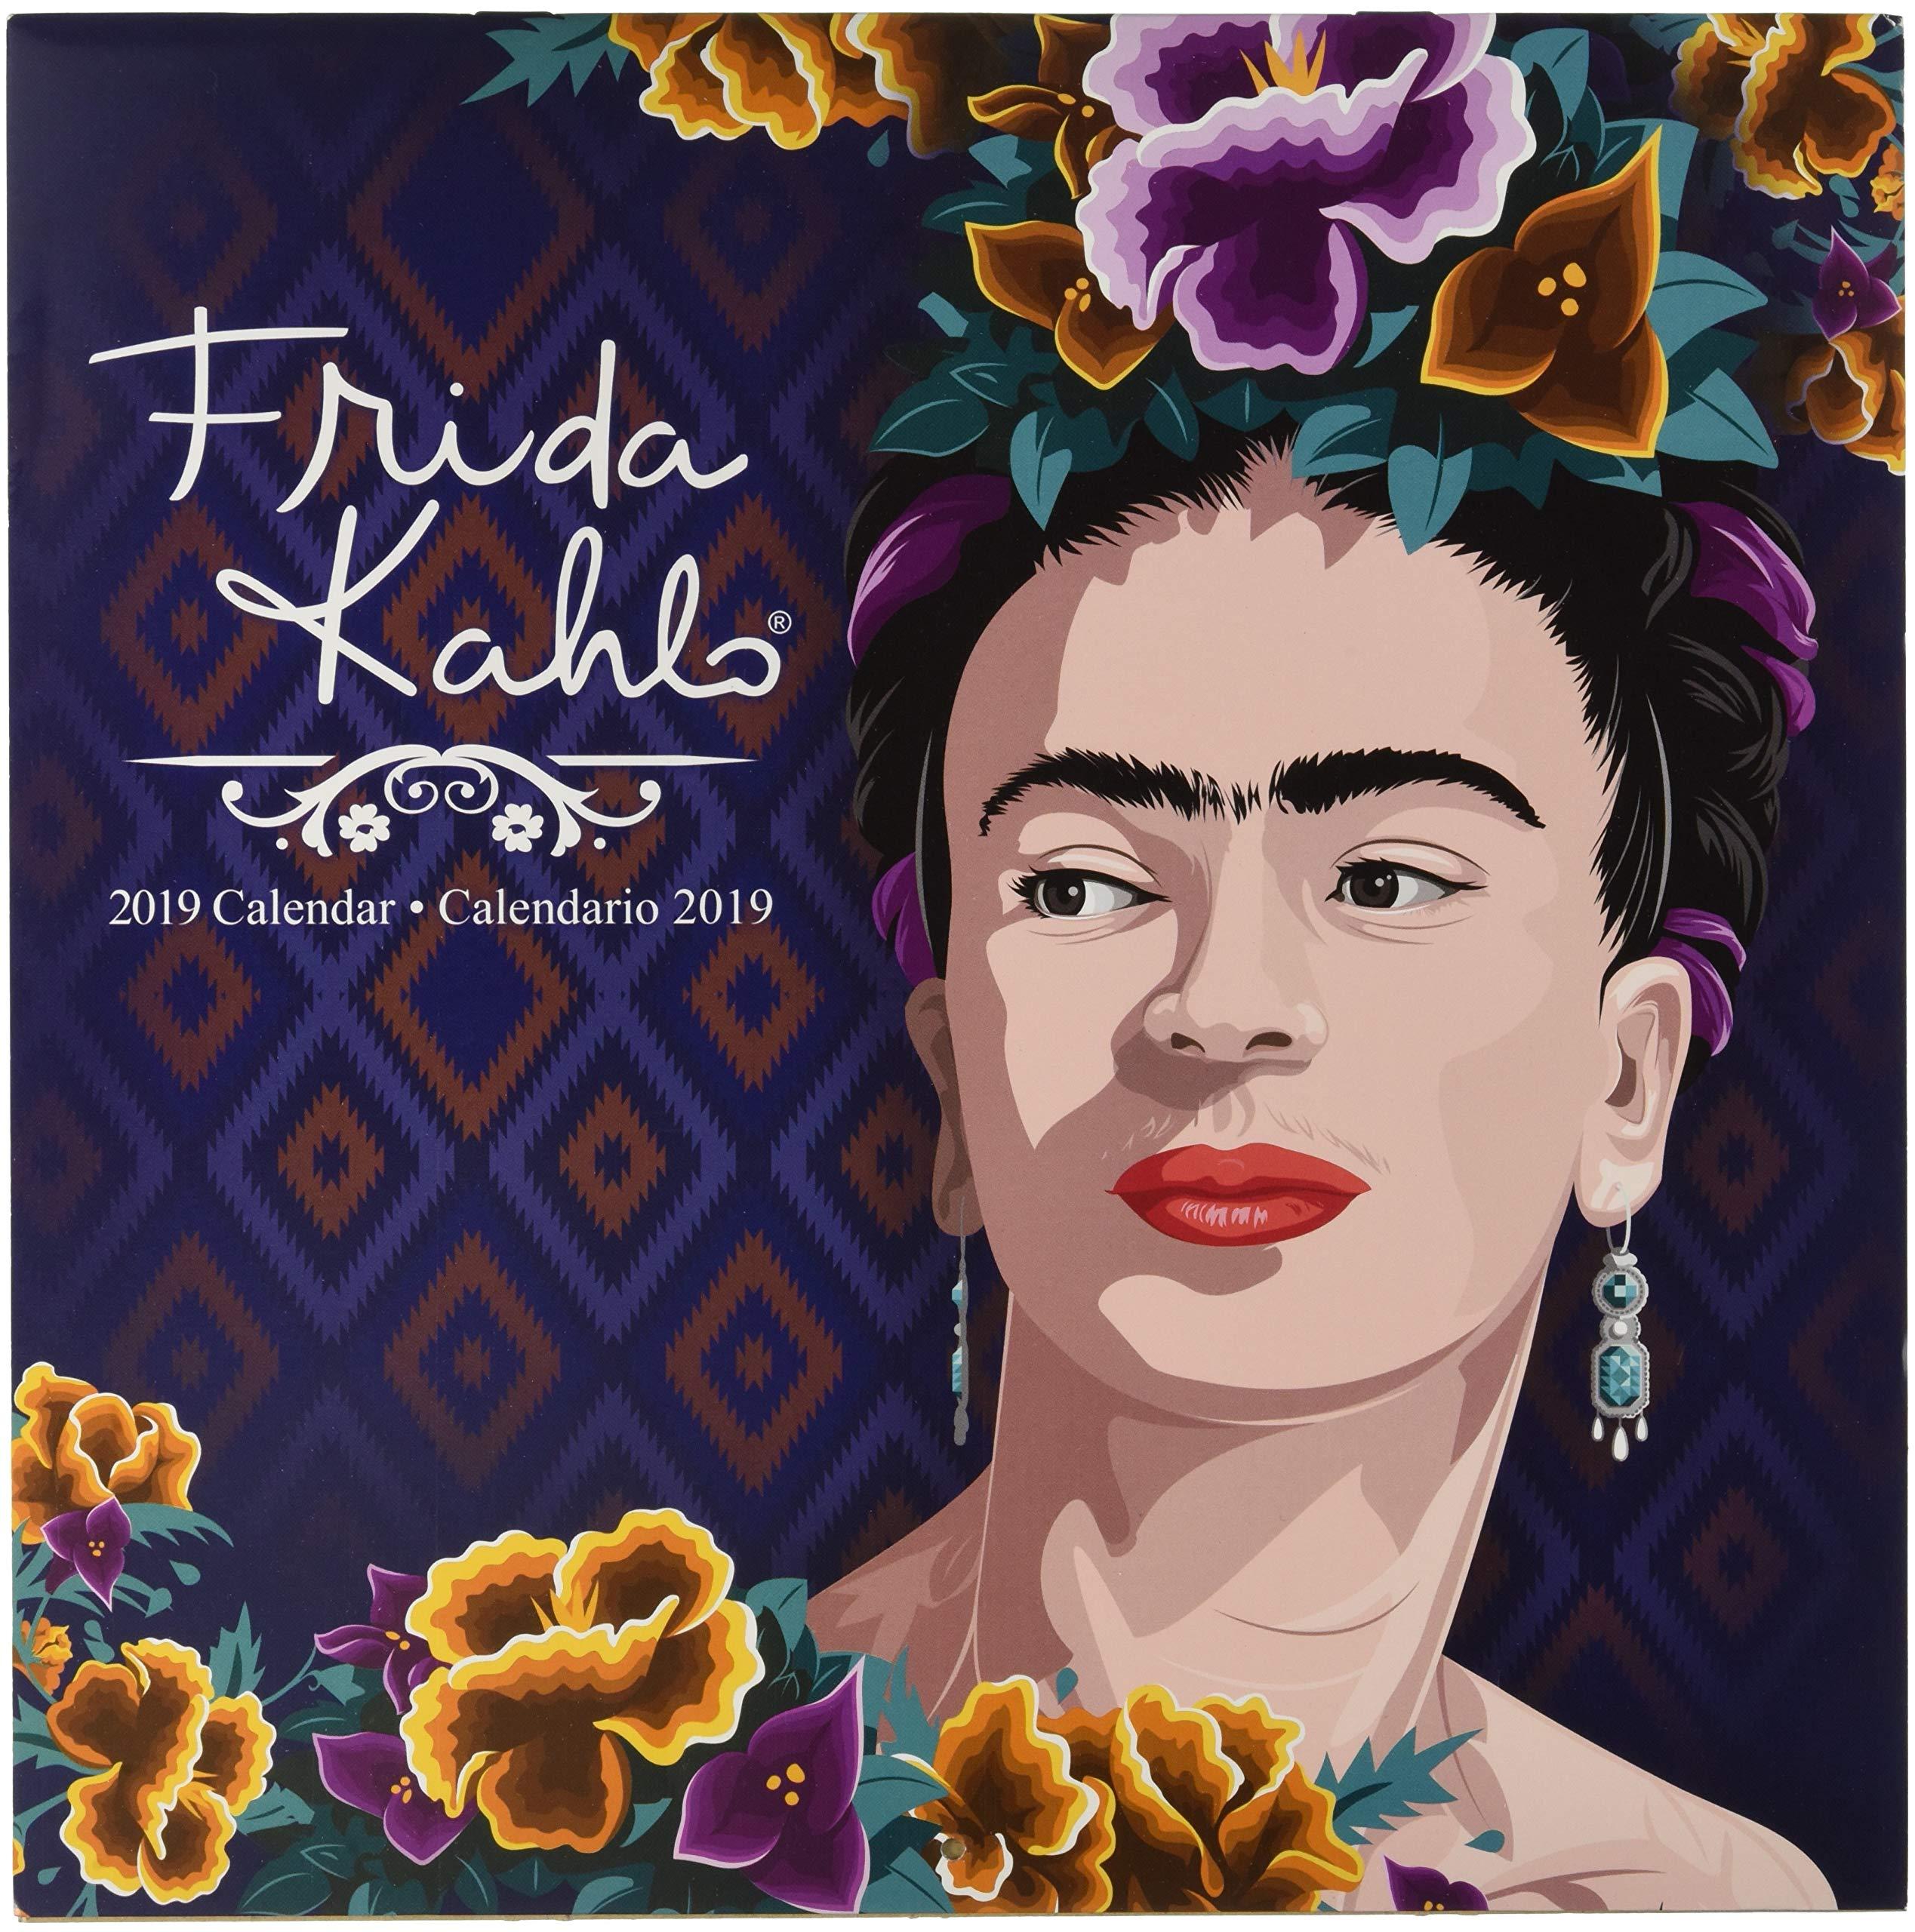 Frida Kahlo 2019 Calendar: Amazon.es: Trends International ...